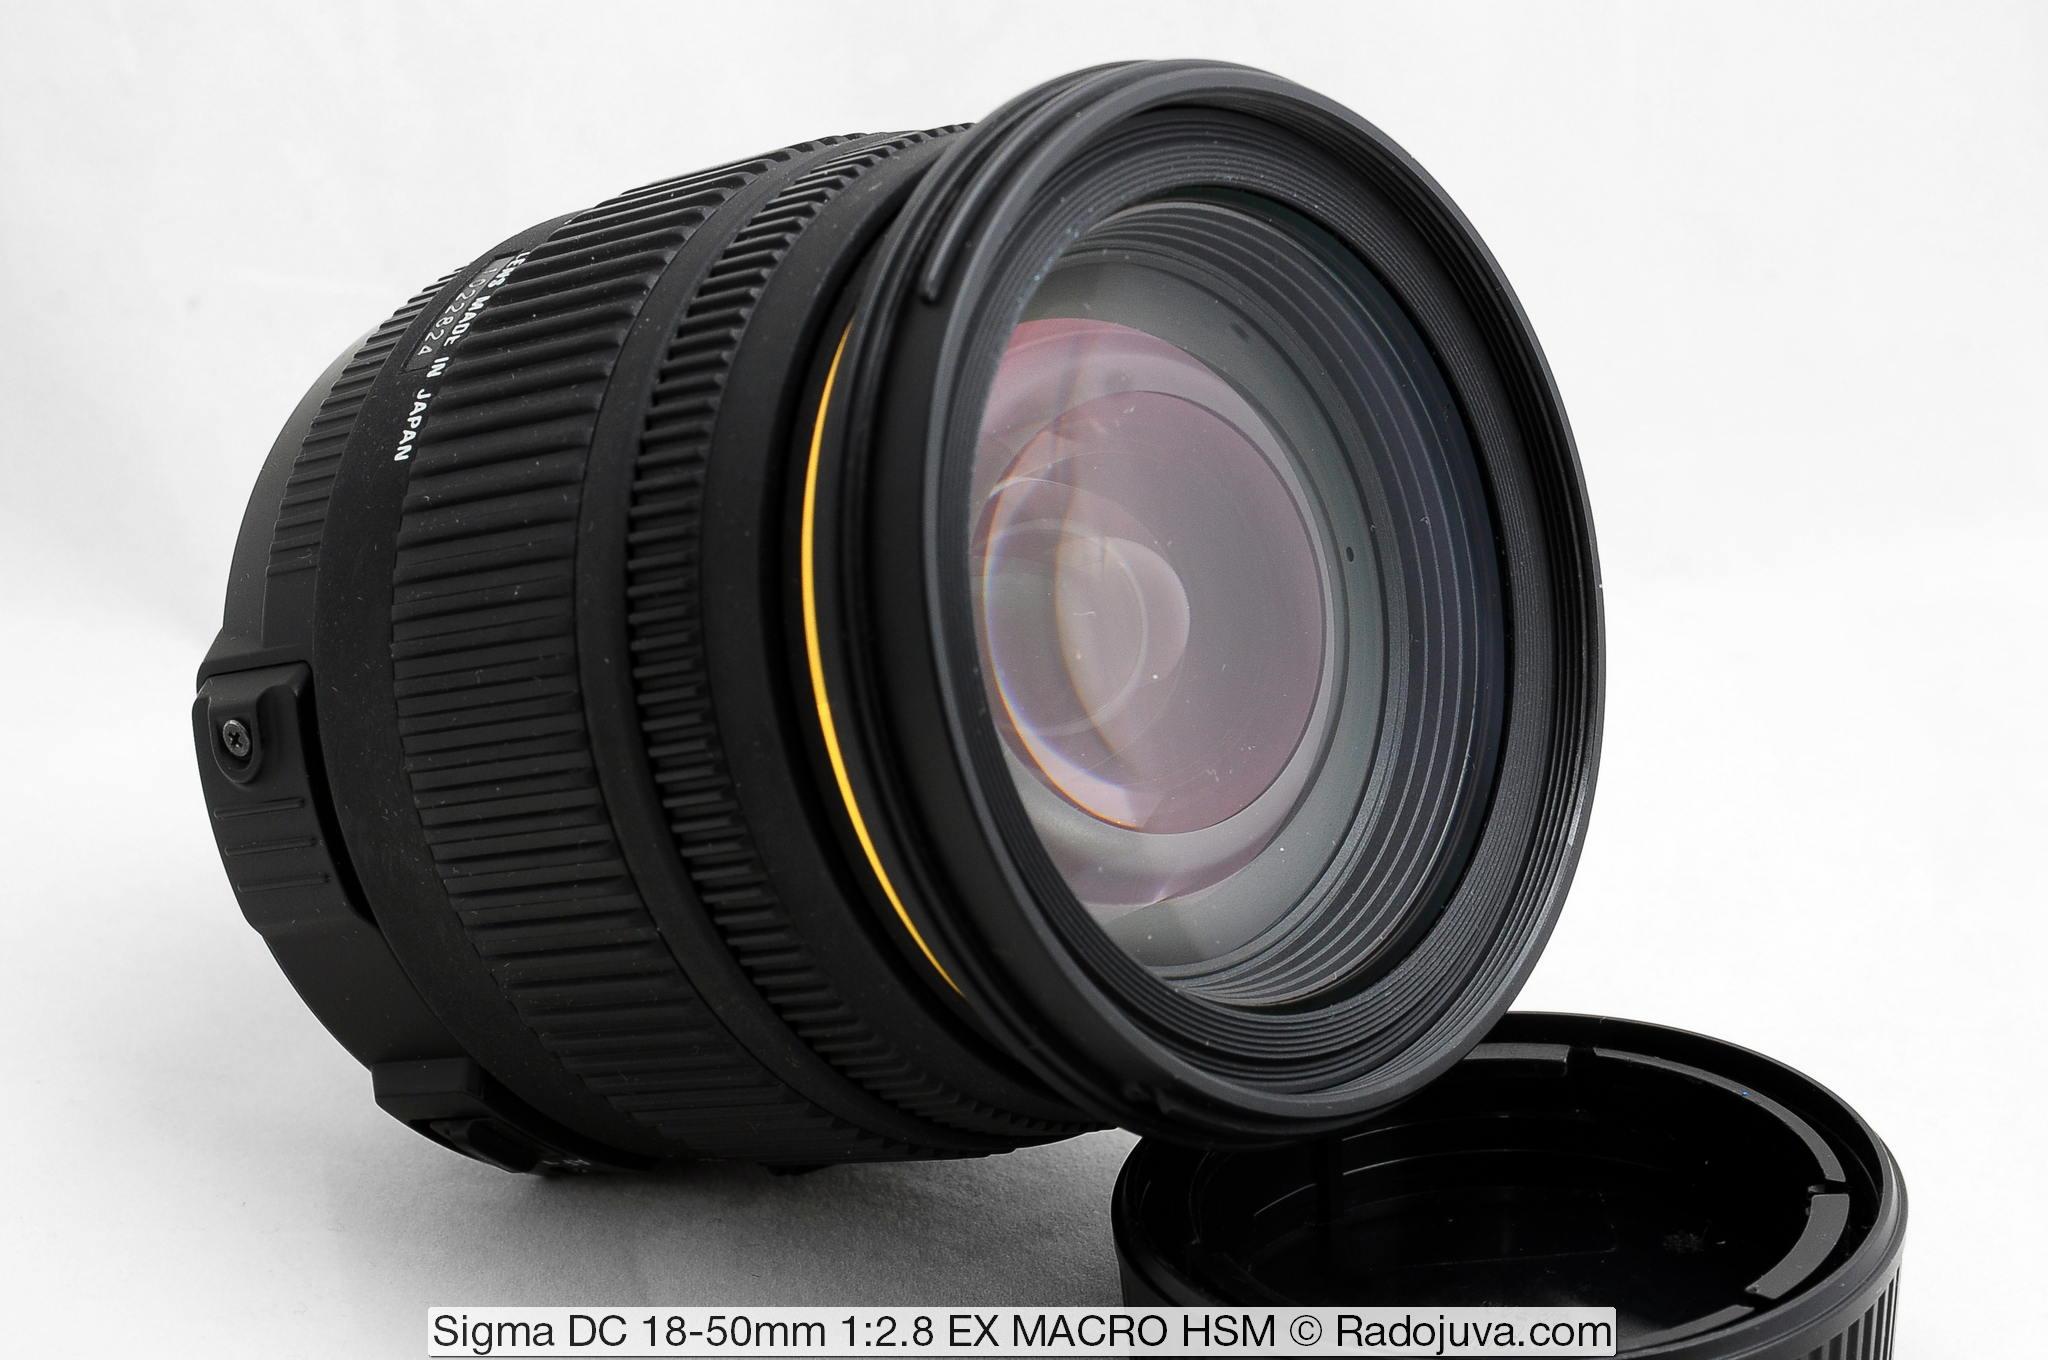 Sigma DC 18-50mm 1:2.8 EX MACRO HSM